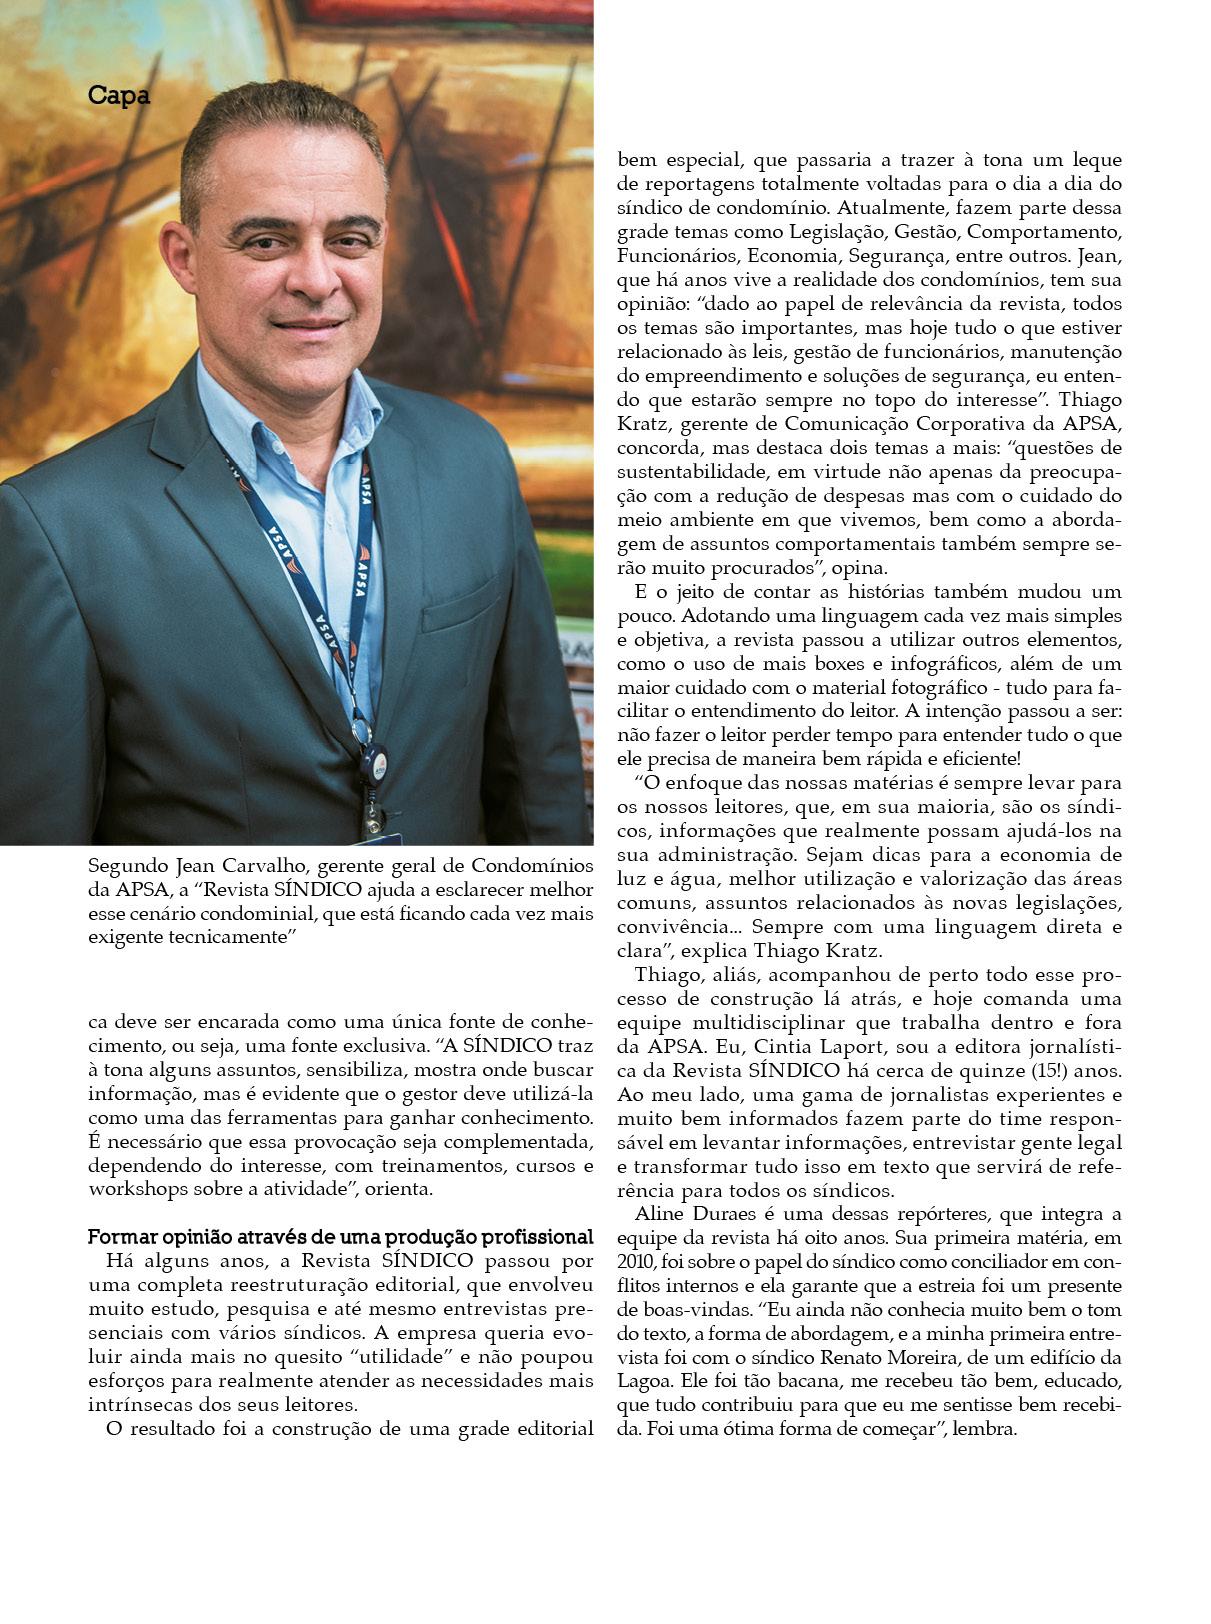 Revista Síndico_ed 24012